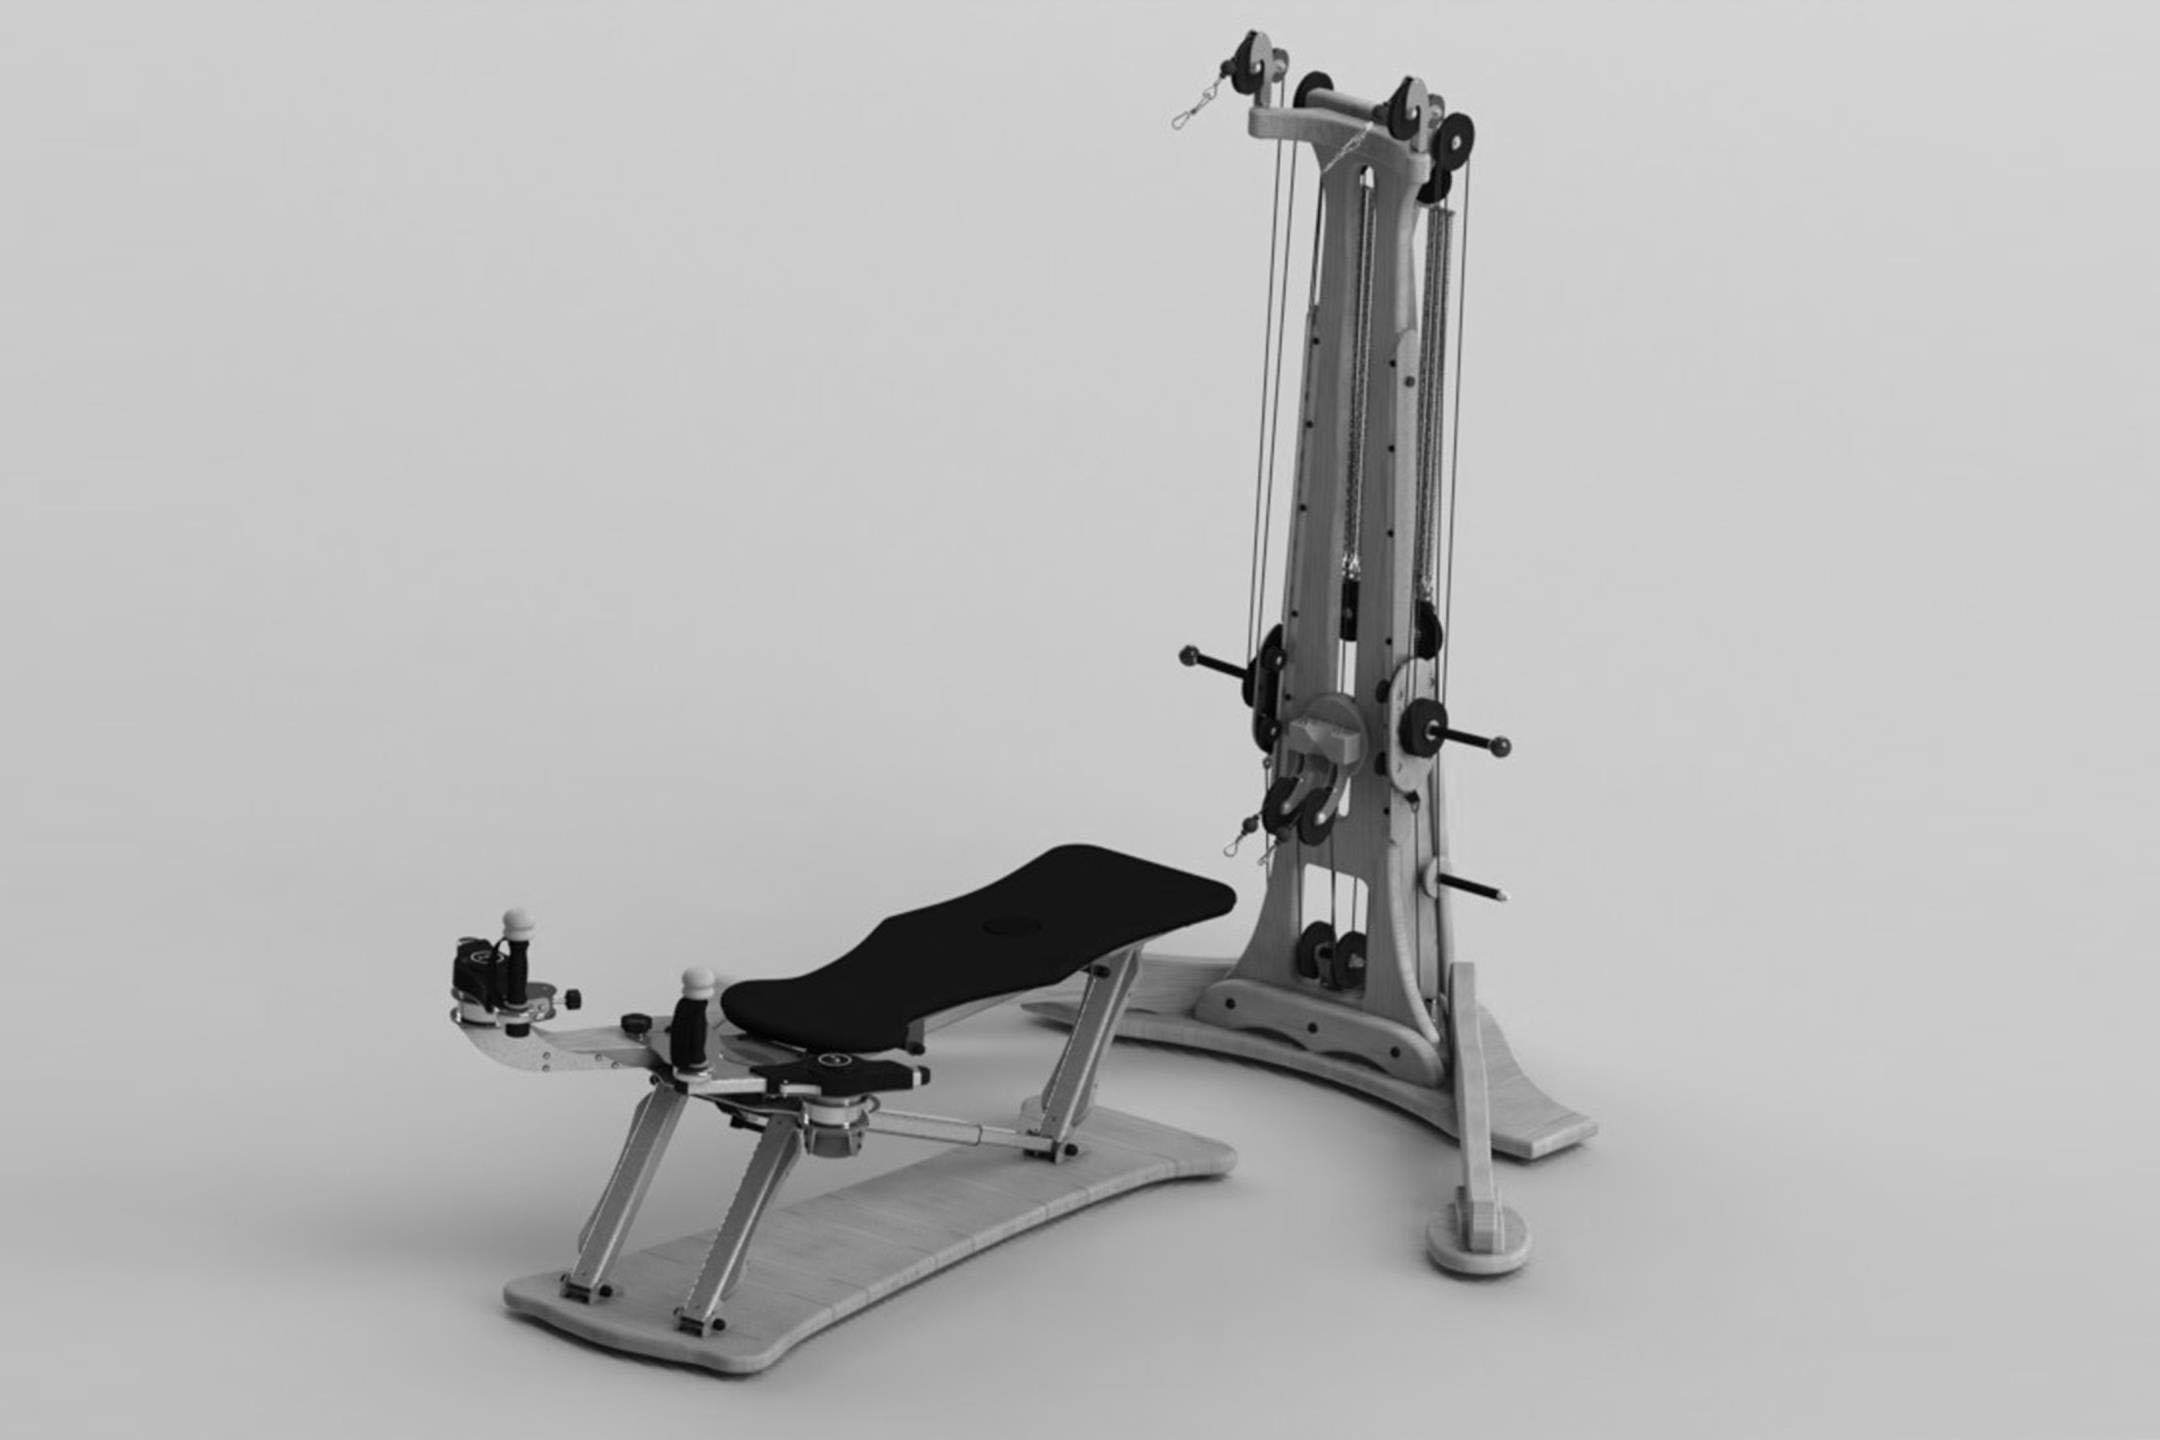 Gyrotonic equipment